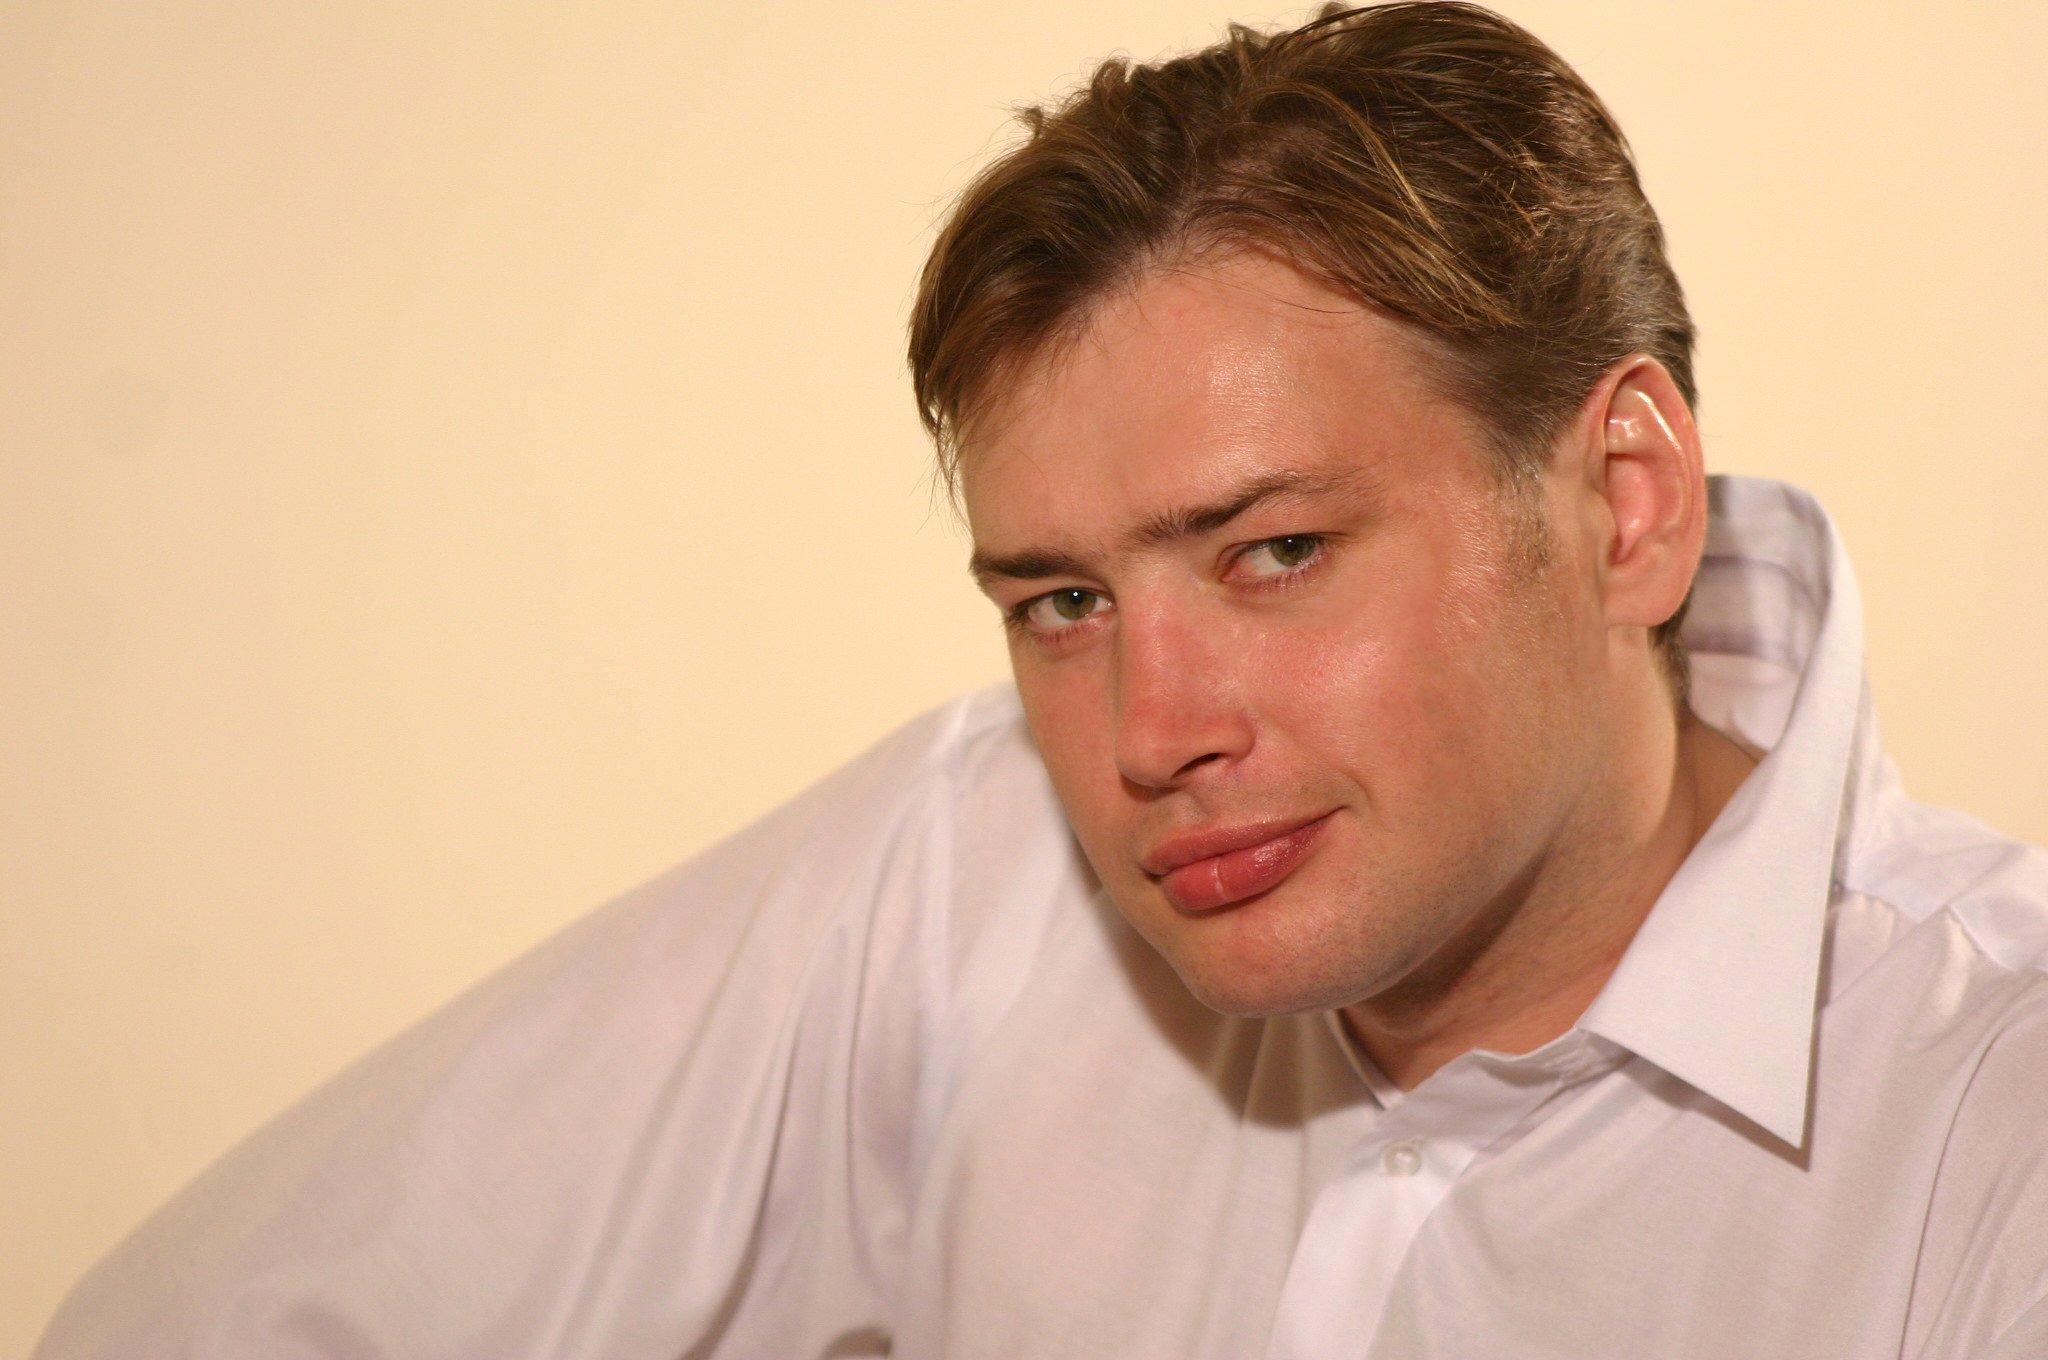 Андрей мальцев актер фото солдаты